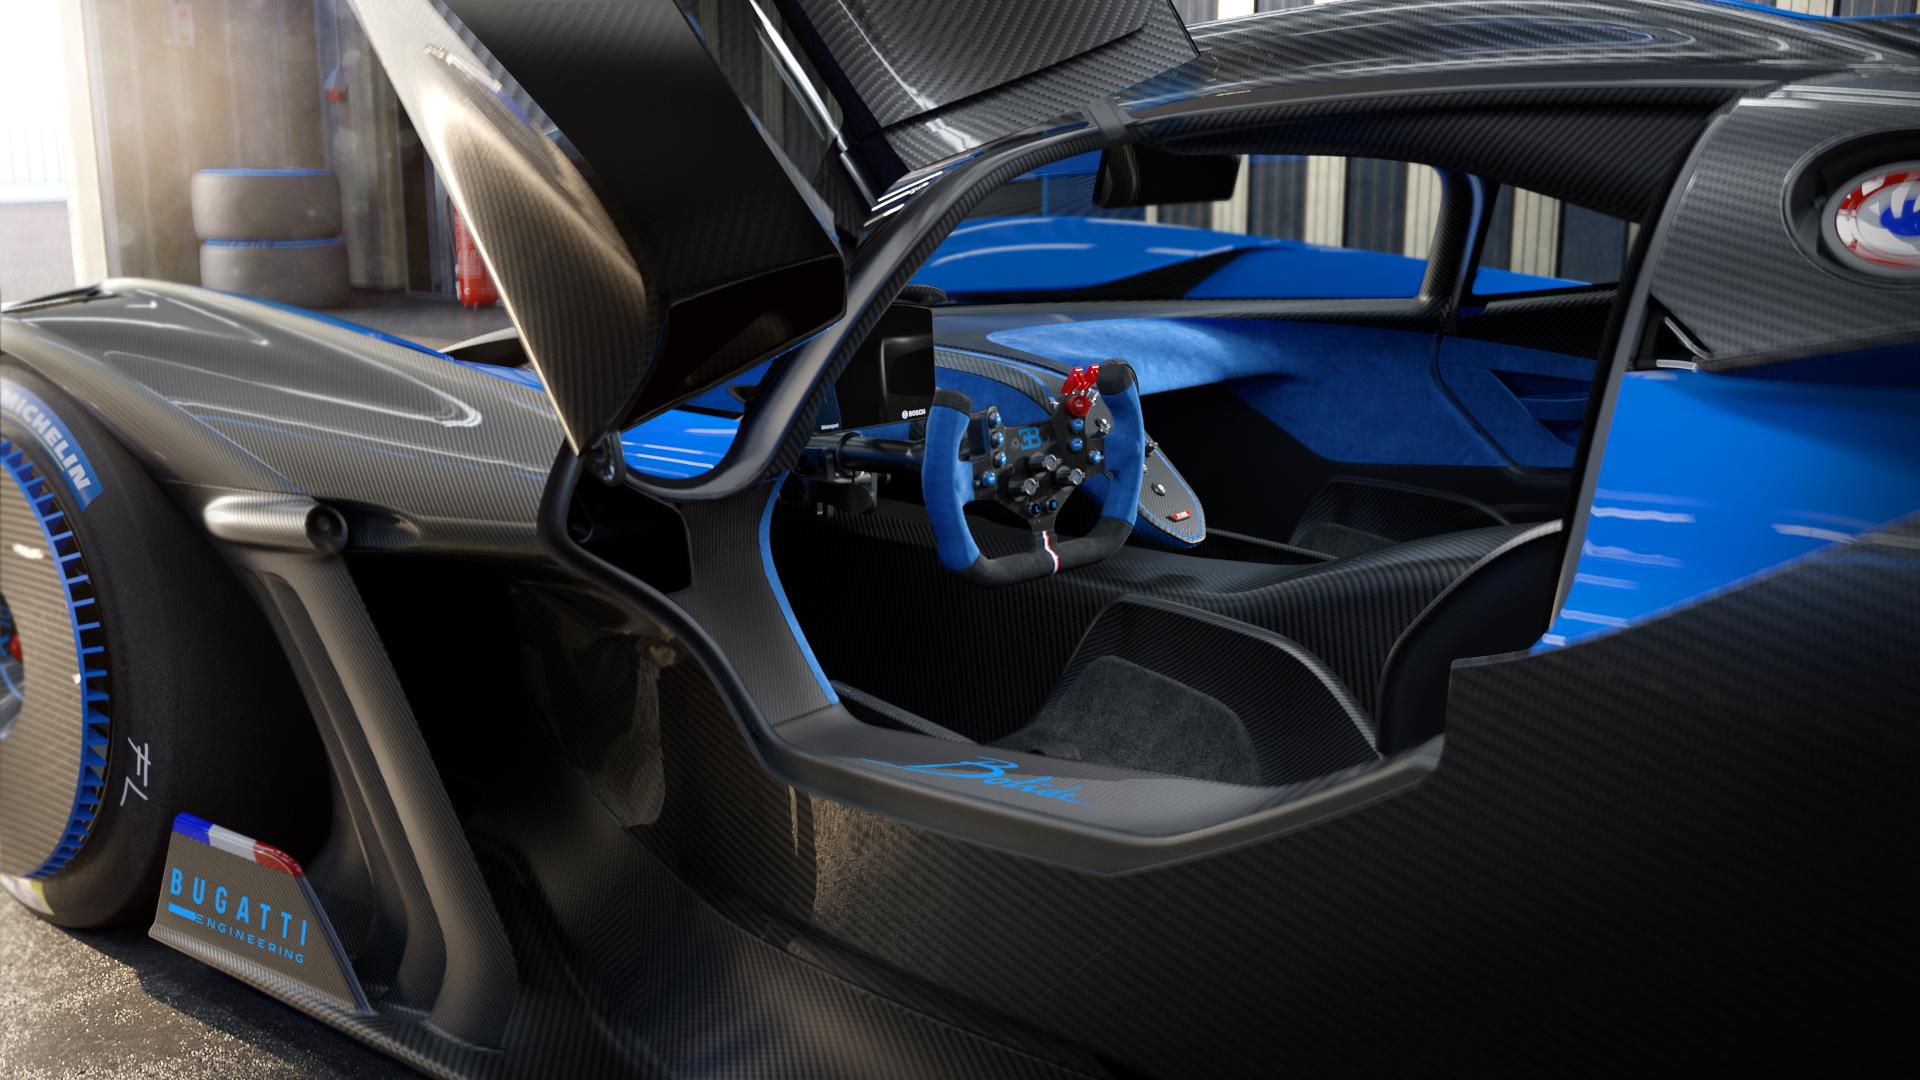 Bugatti bolide cockpit inside look